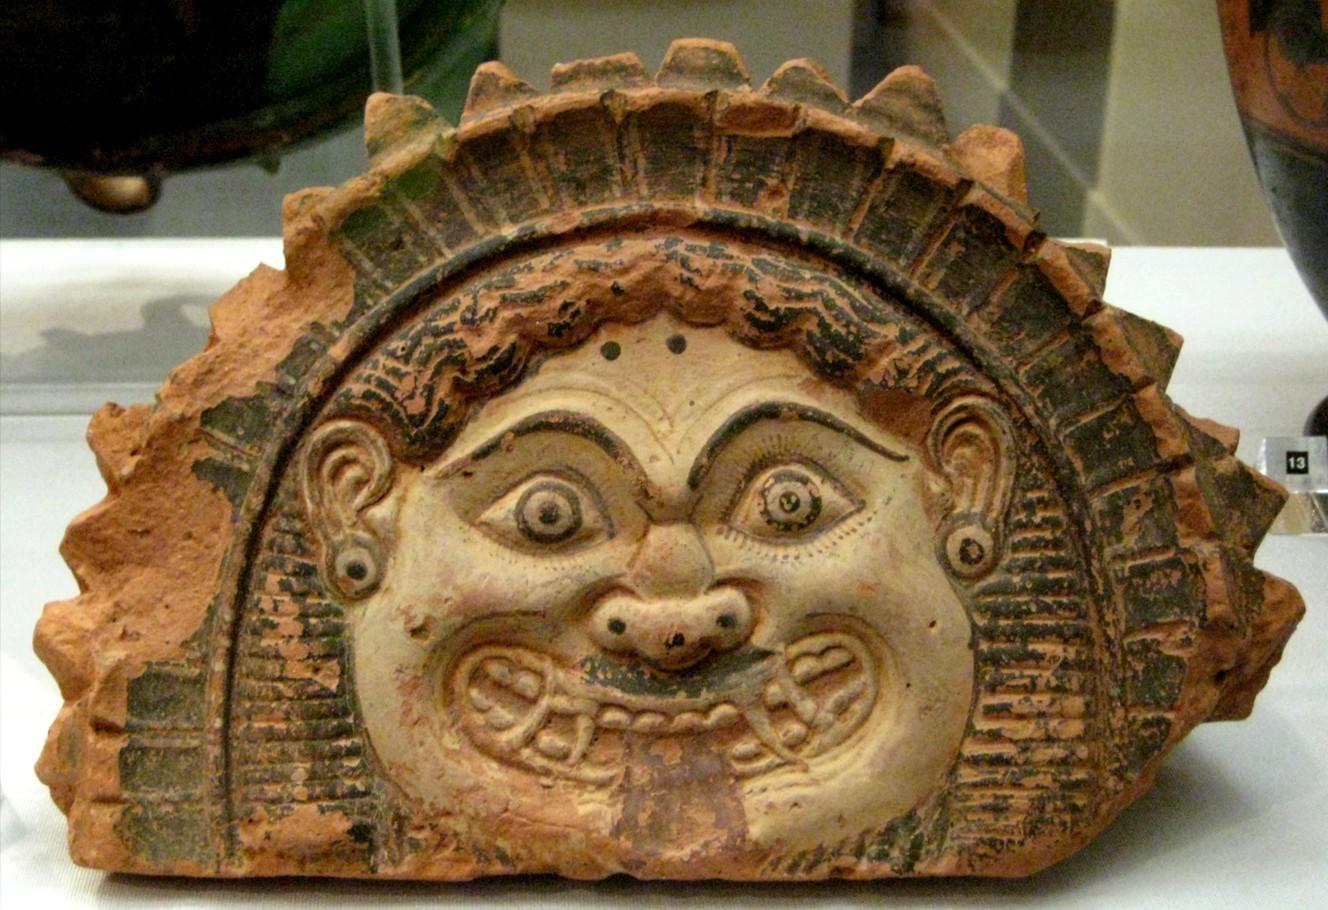 Antefija de cabeza de Gorgona,  IV a. C., Grecia ( fuente )